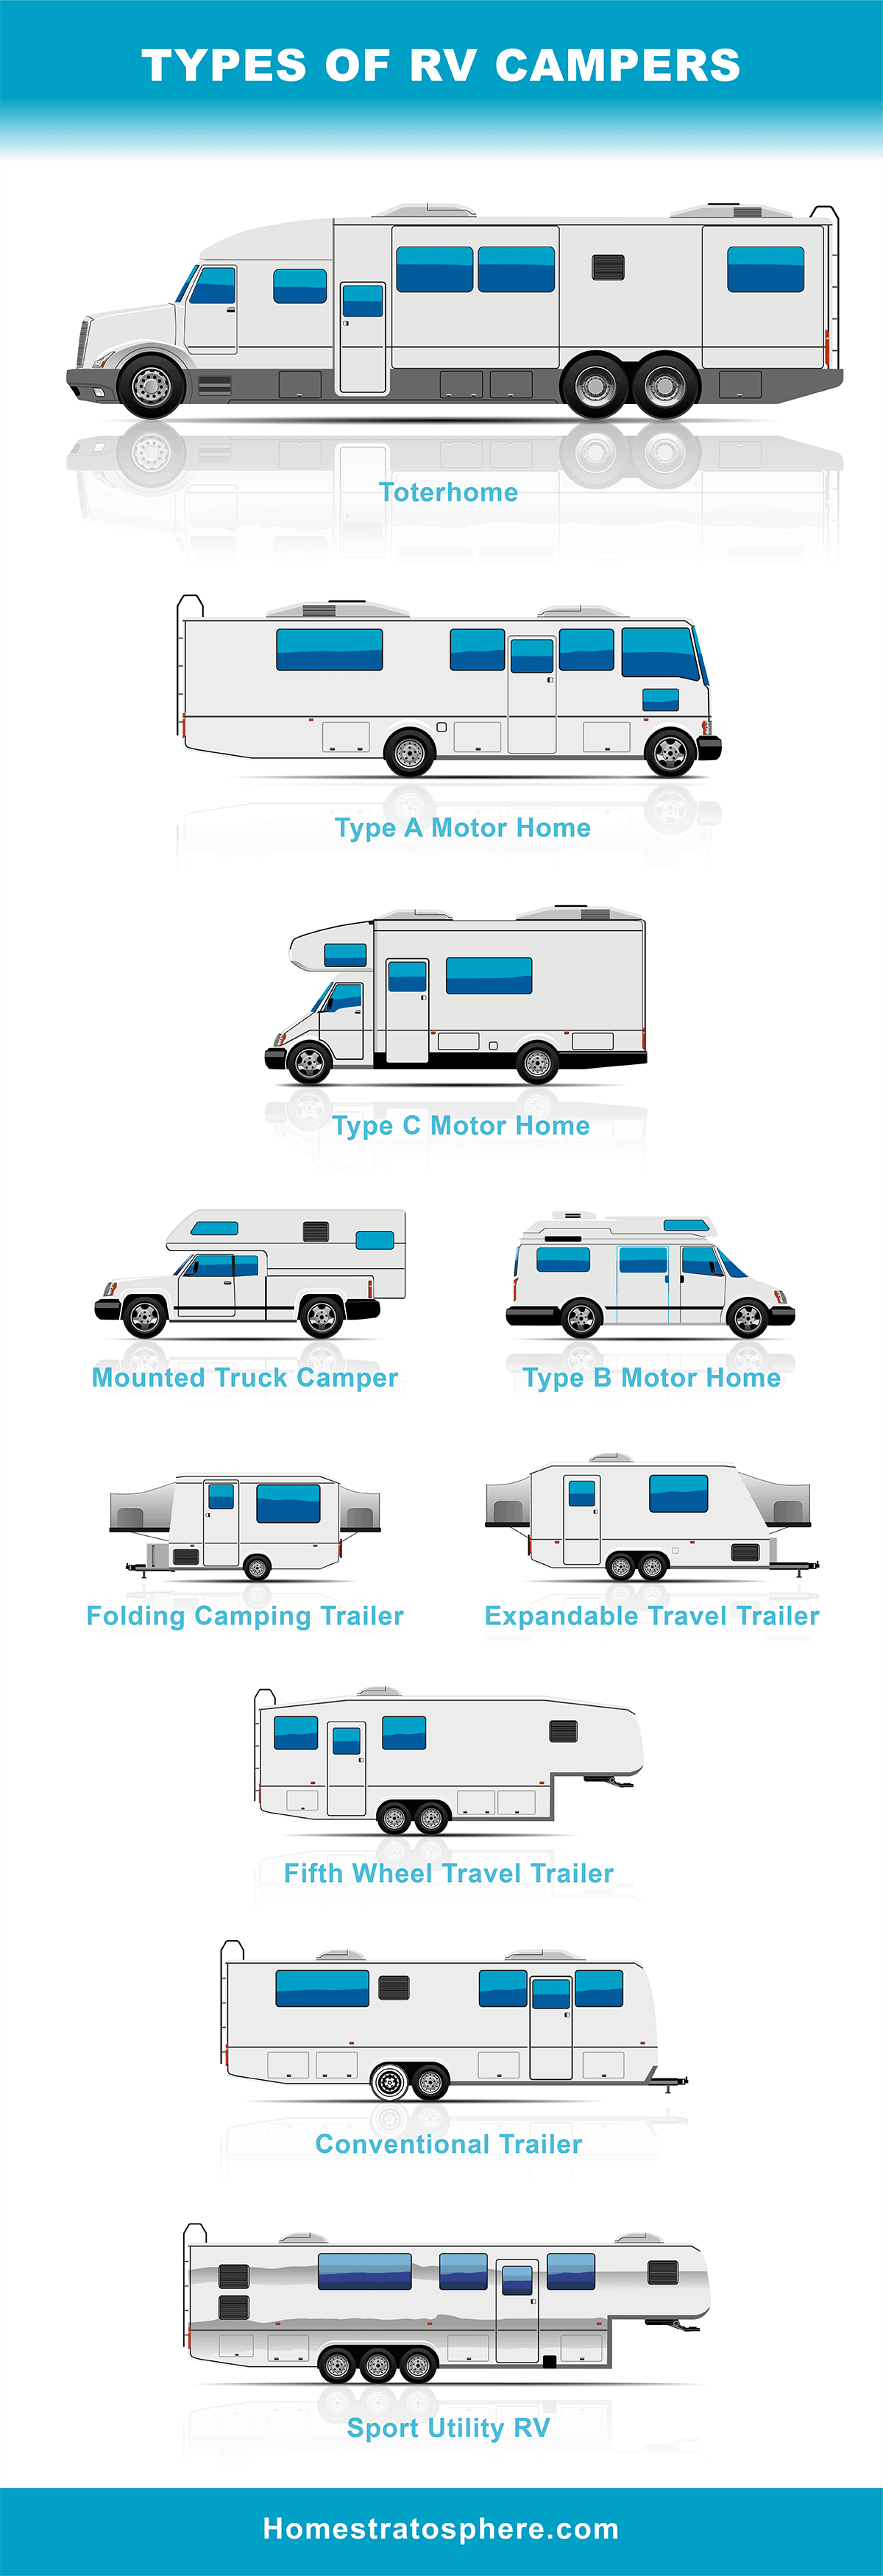 Types of RVs illustration chart